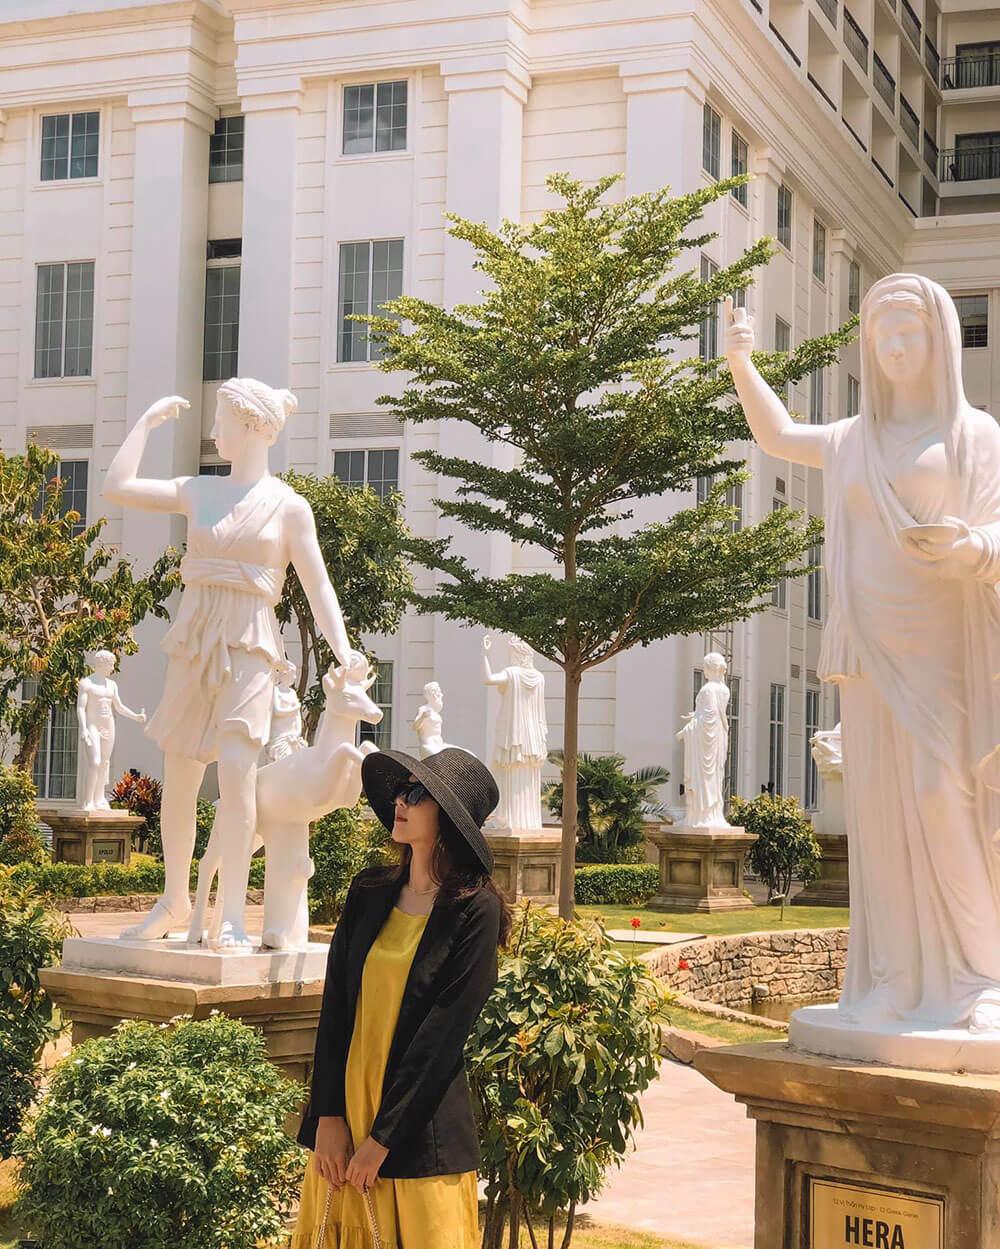 Cong Vien Ky Quan The Gioi Khach San Danang Golden Bay Review Hue Da Nang Hoi An Ninh Binh 7n7d Chi Voi 8 Trieu Tin Duoc Khong